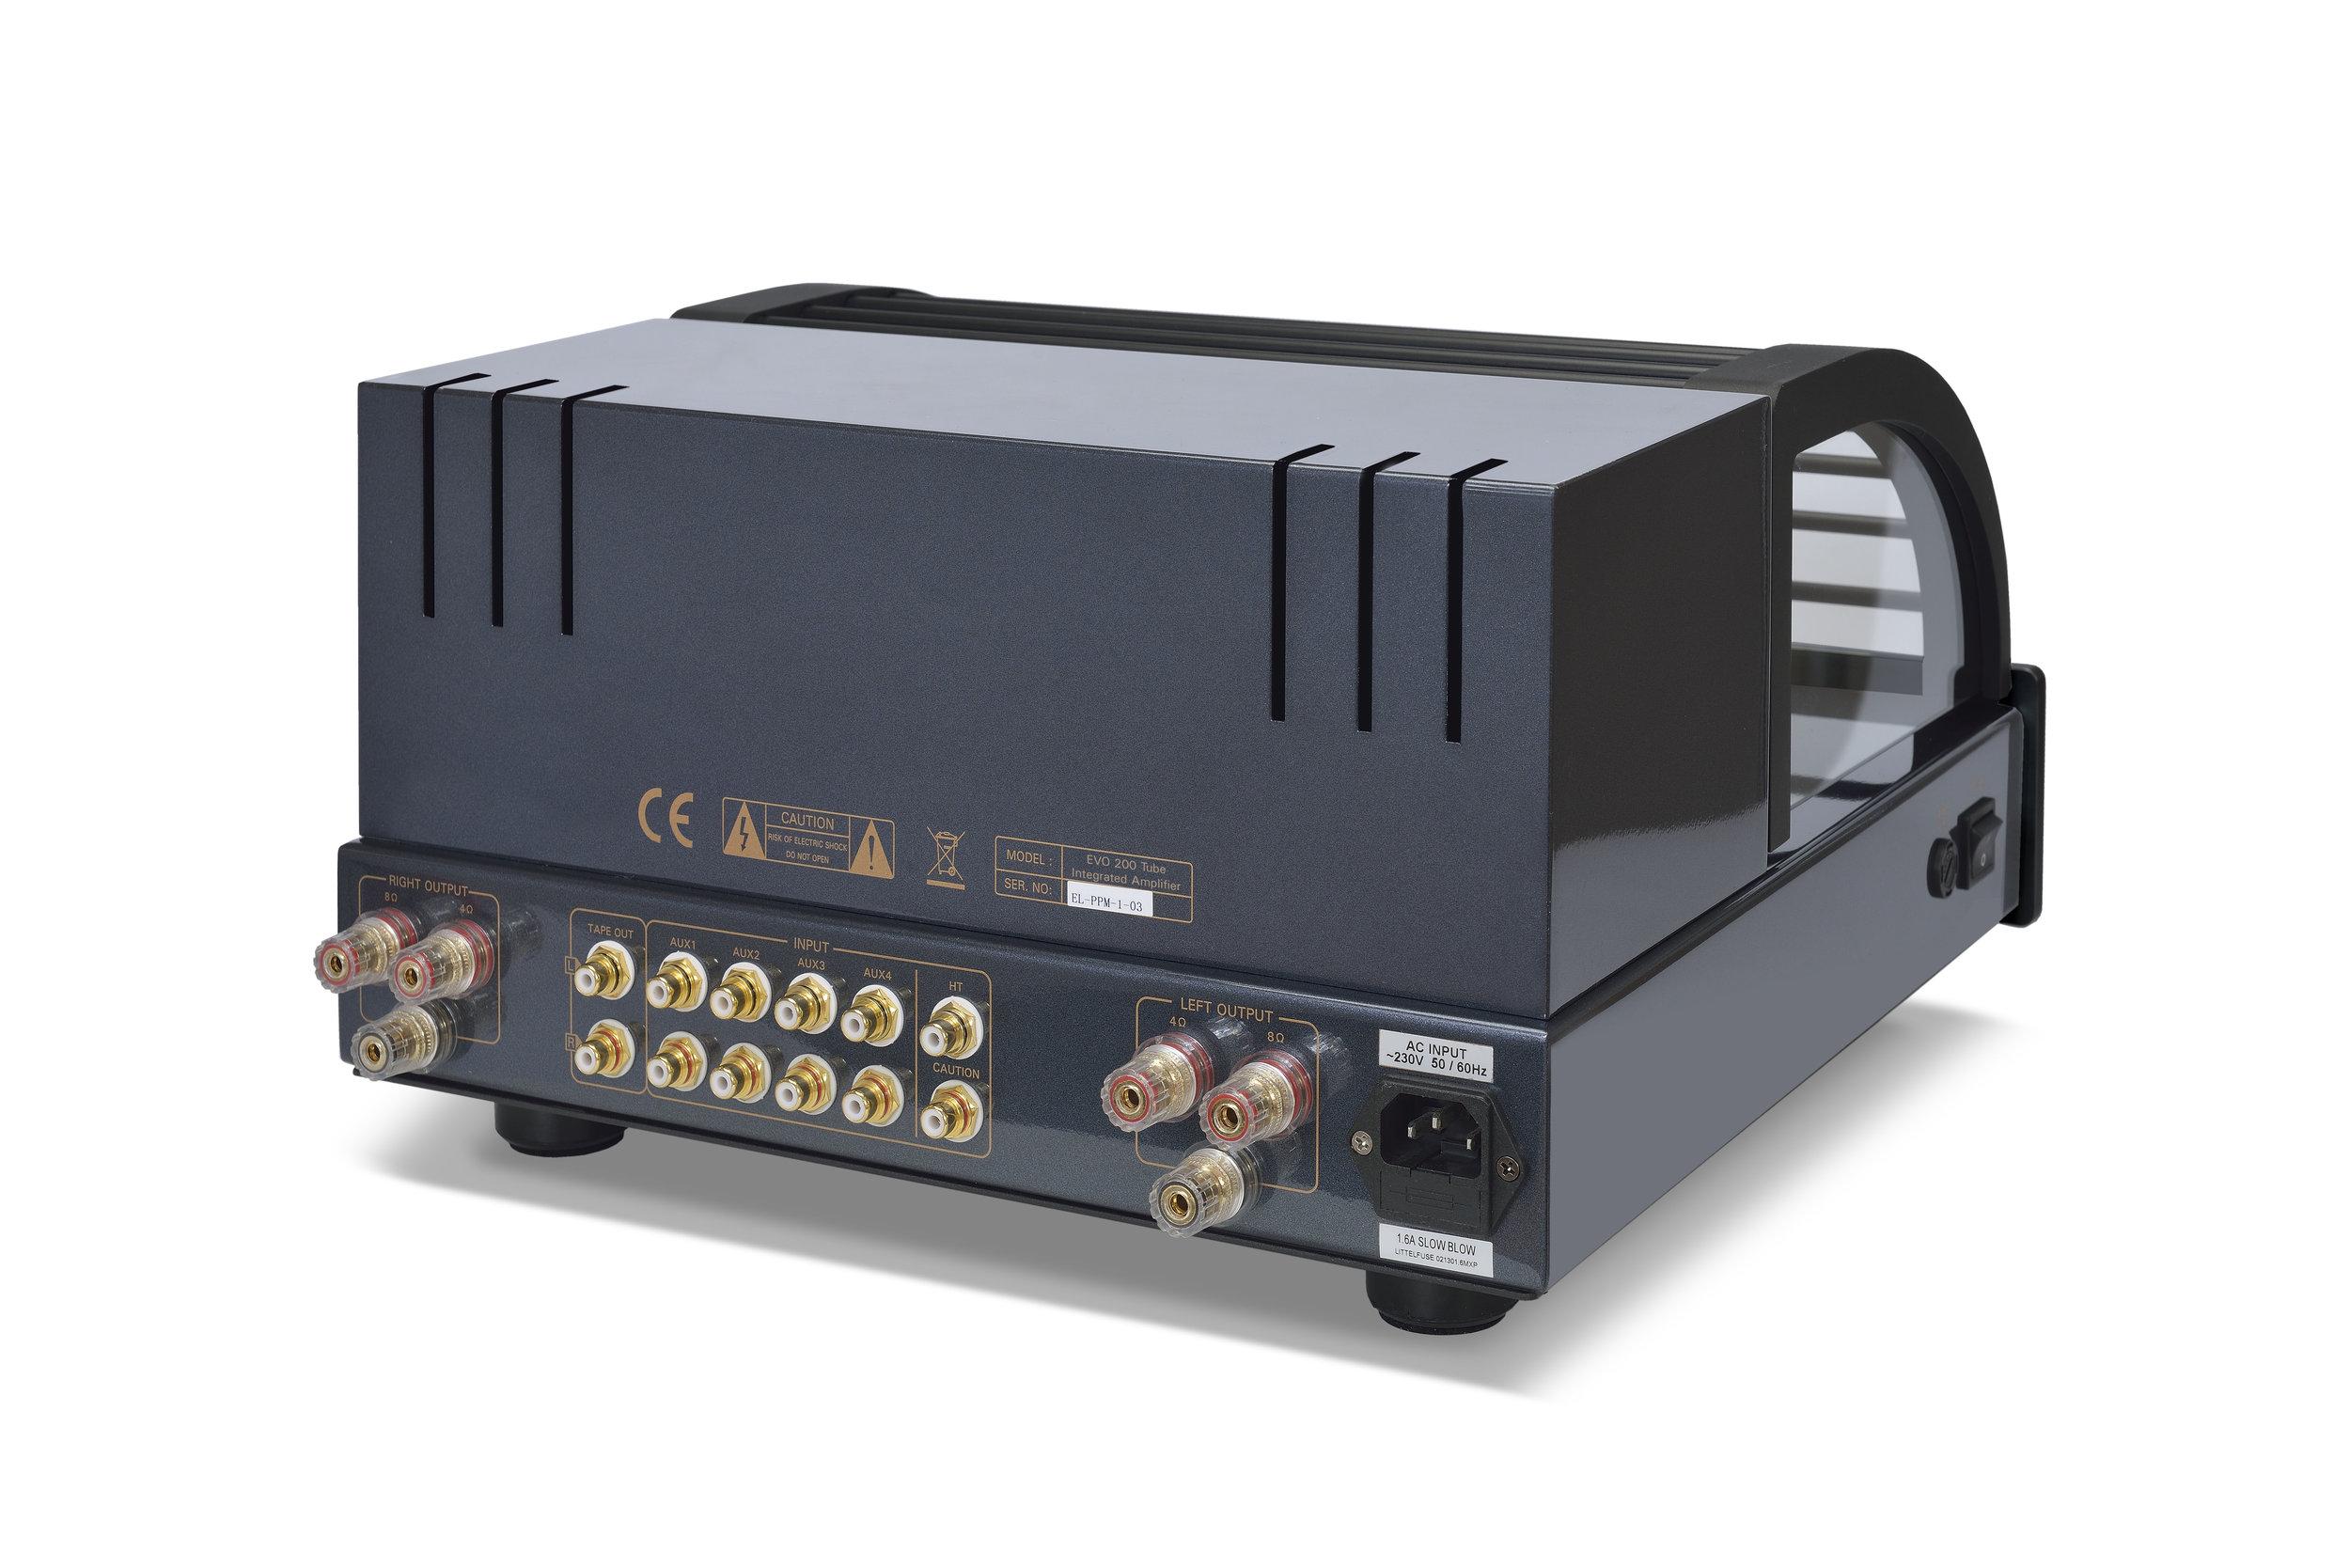 117b - PrimaLuna Evo 200 Tube Integrated Amplifier - black - back - slanted - white background.jpg